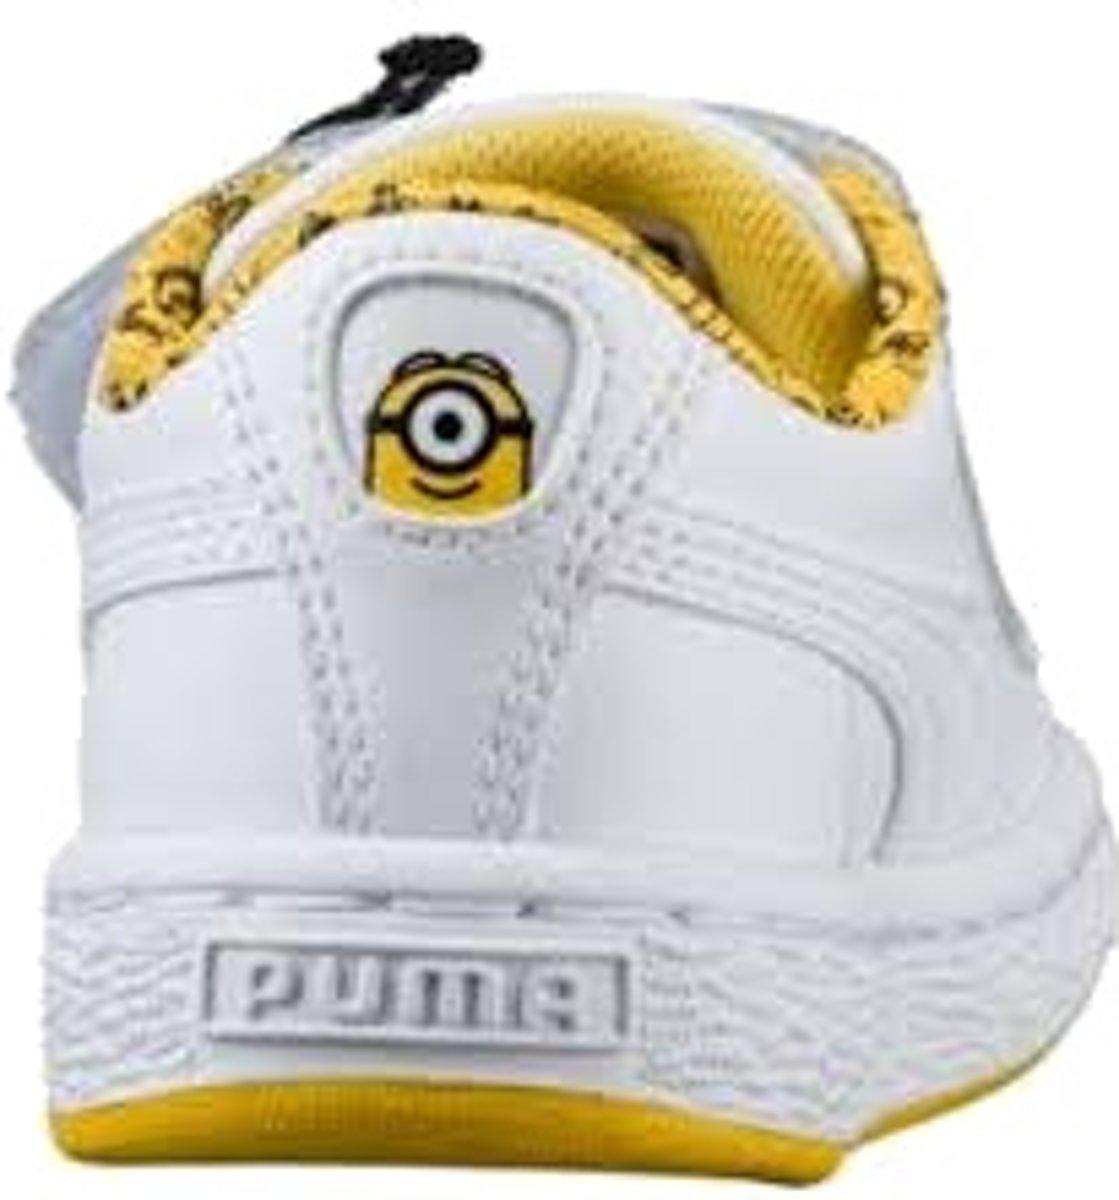 Panier Pumas Les Sbires Wrap Baskets Esprit Junior vhjWQZF